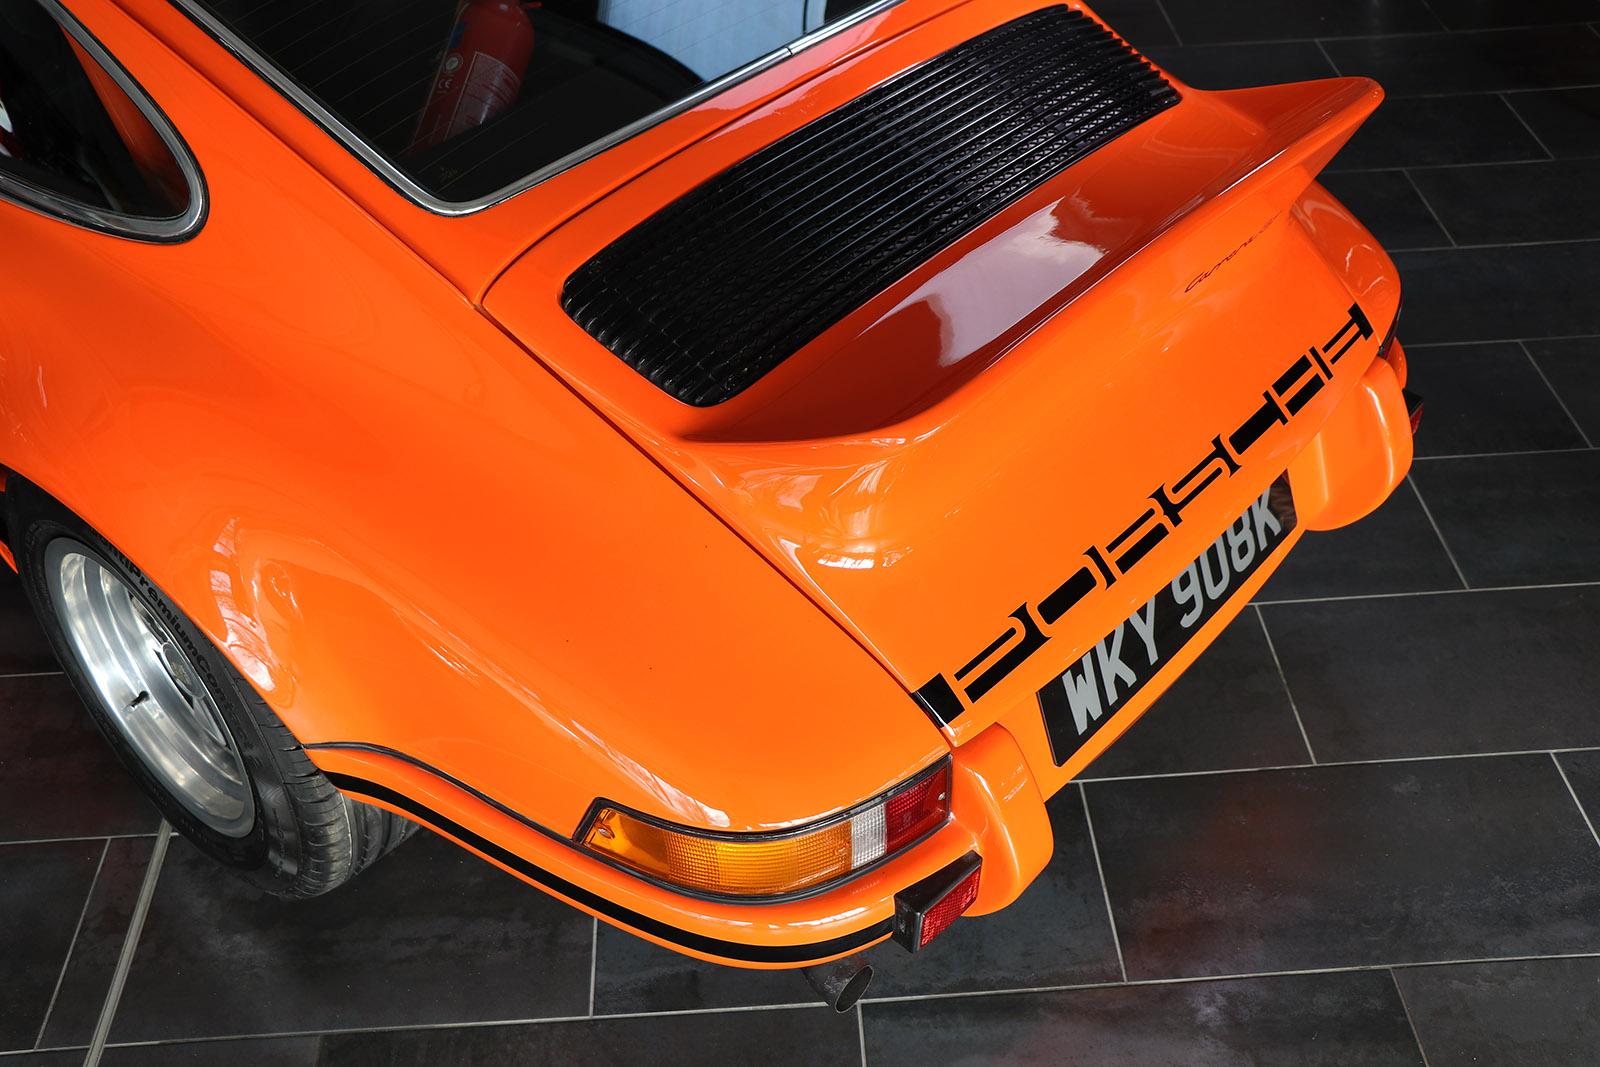 1972-Porsche 911 S-orange-evocation-sayer selection-8-web.jpg